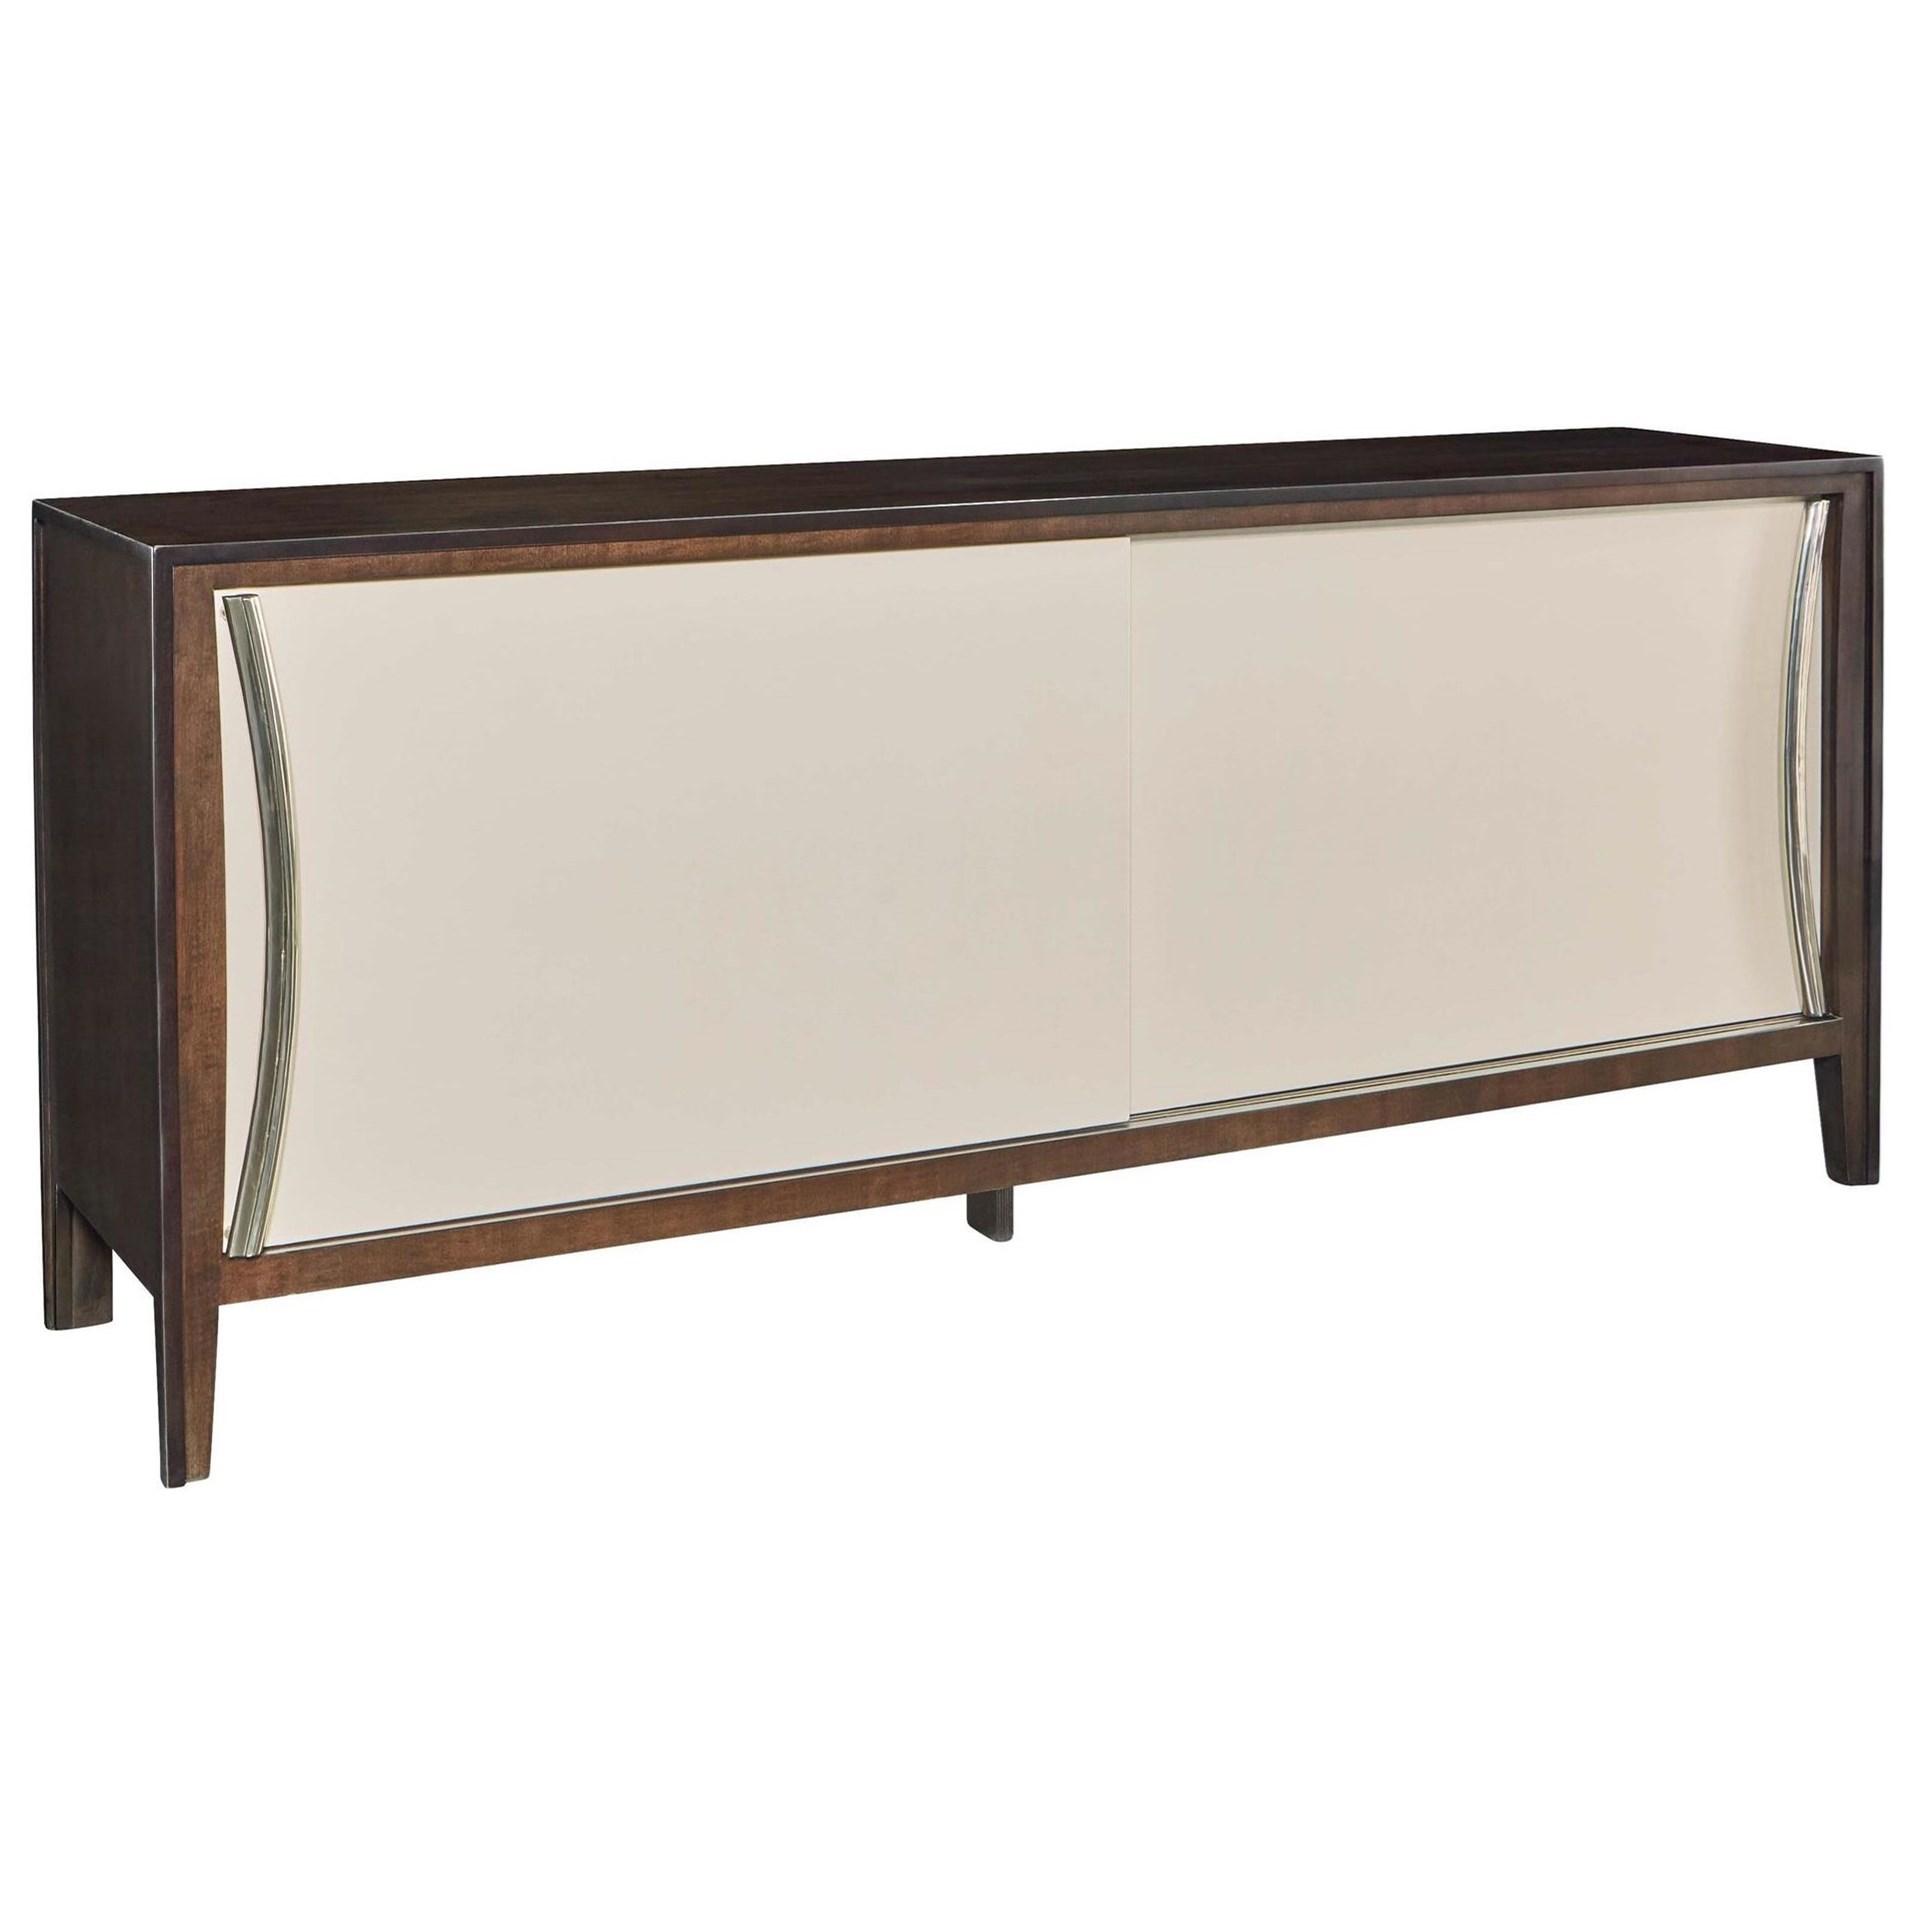 Fine Furniture Design DecoLa Credence Credenza ...